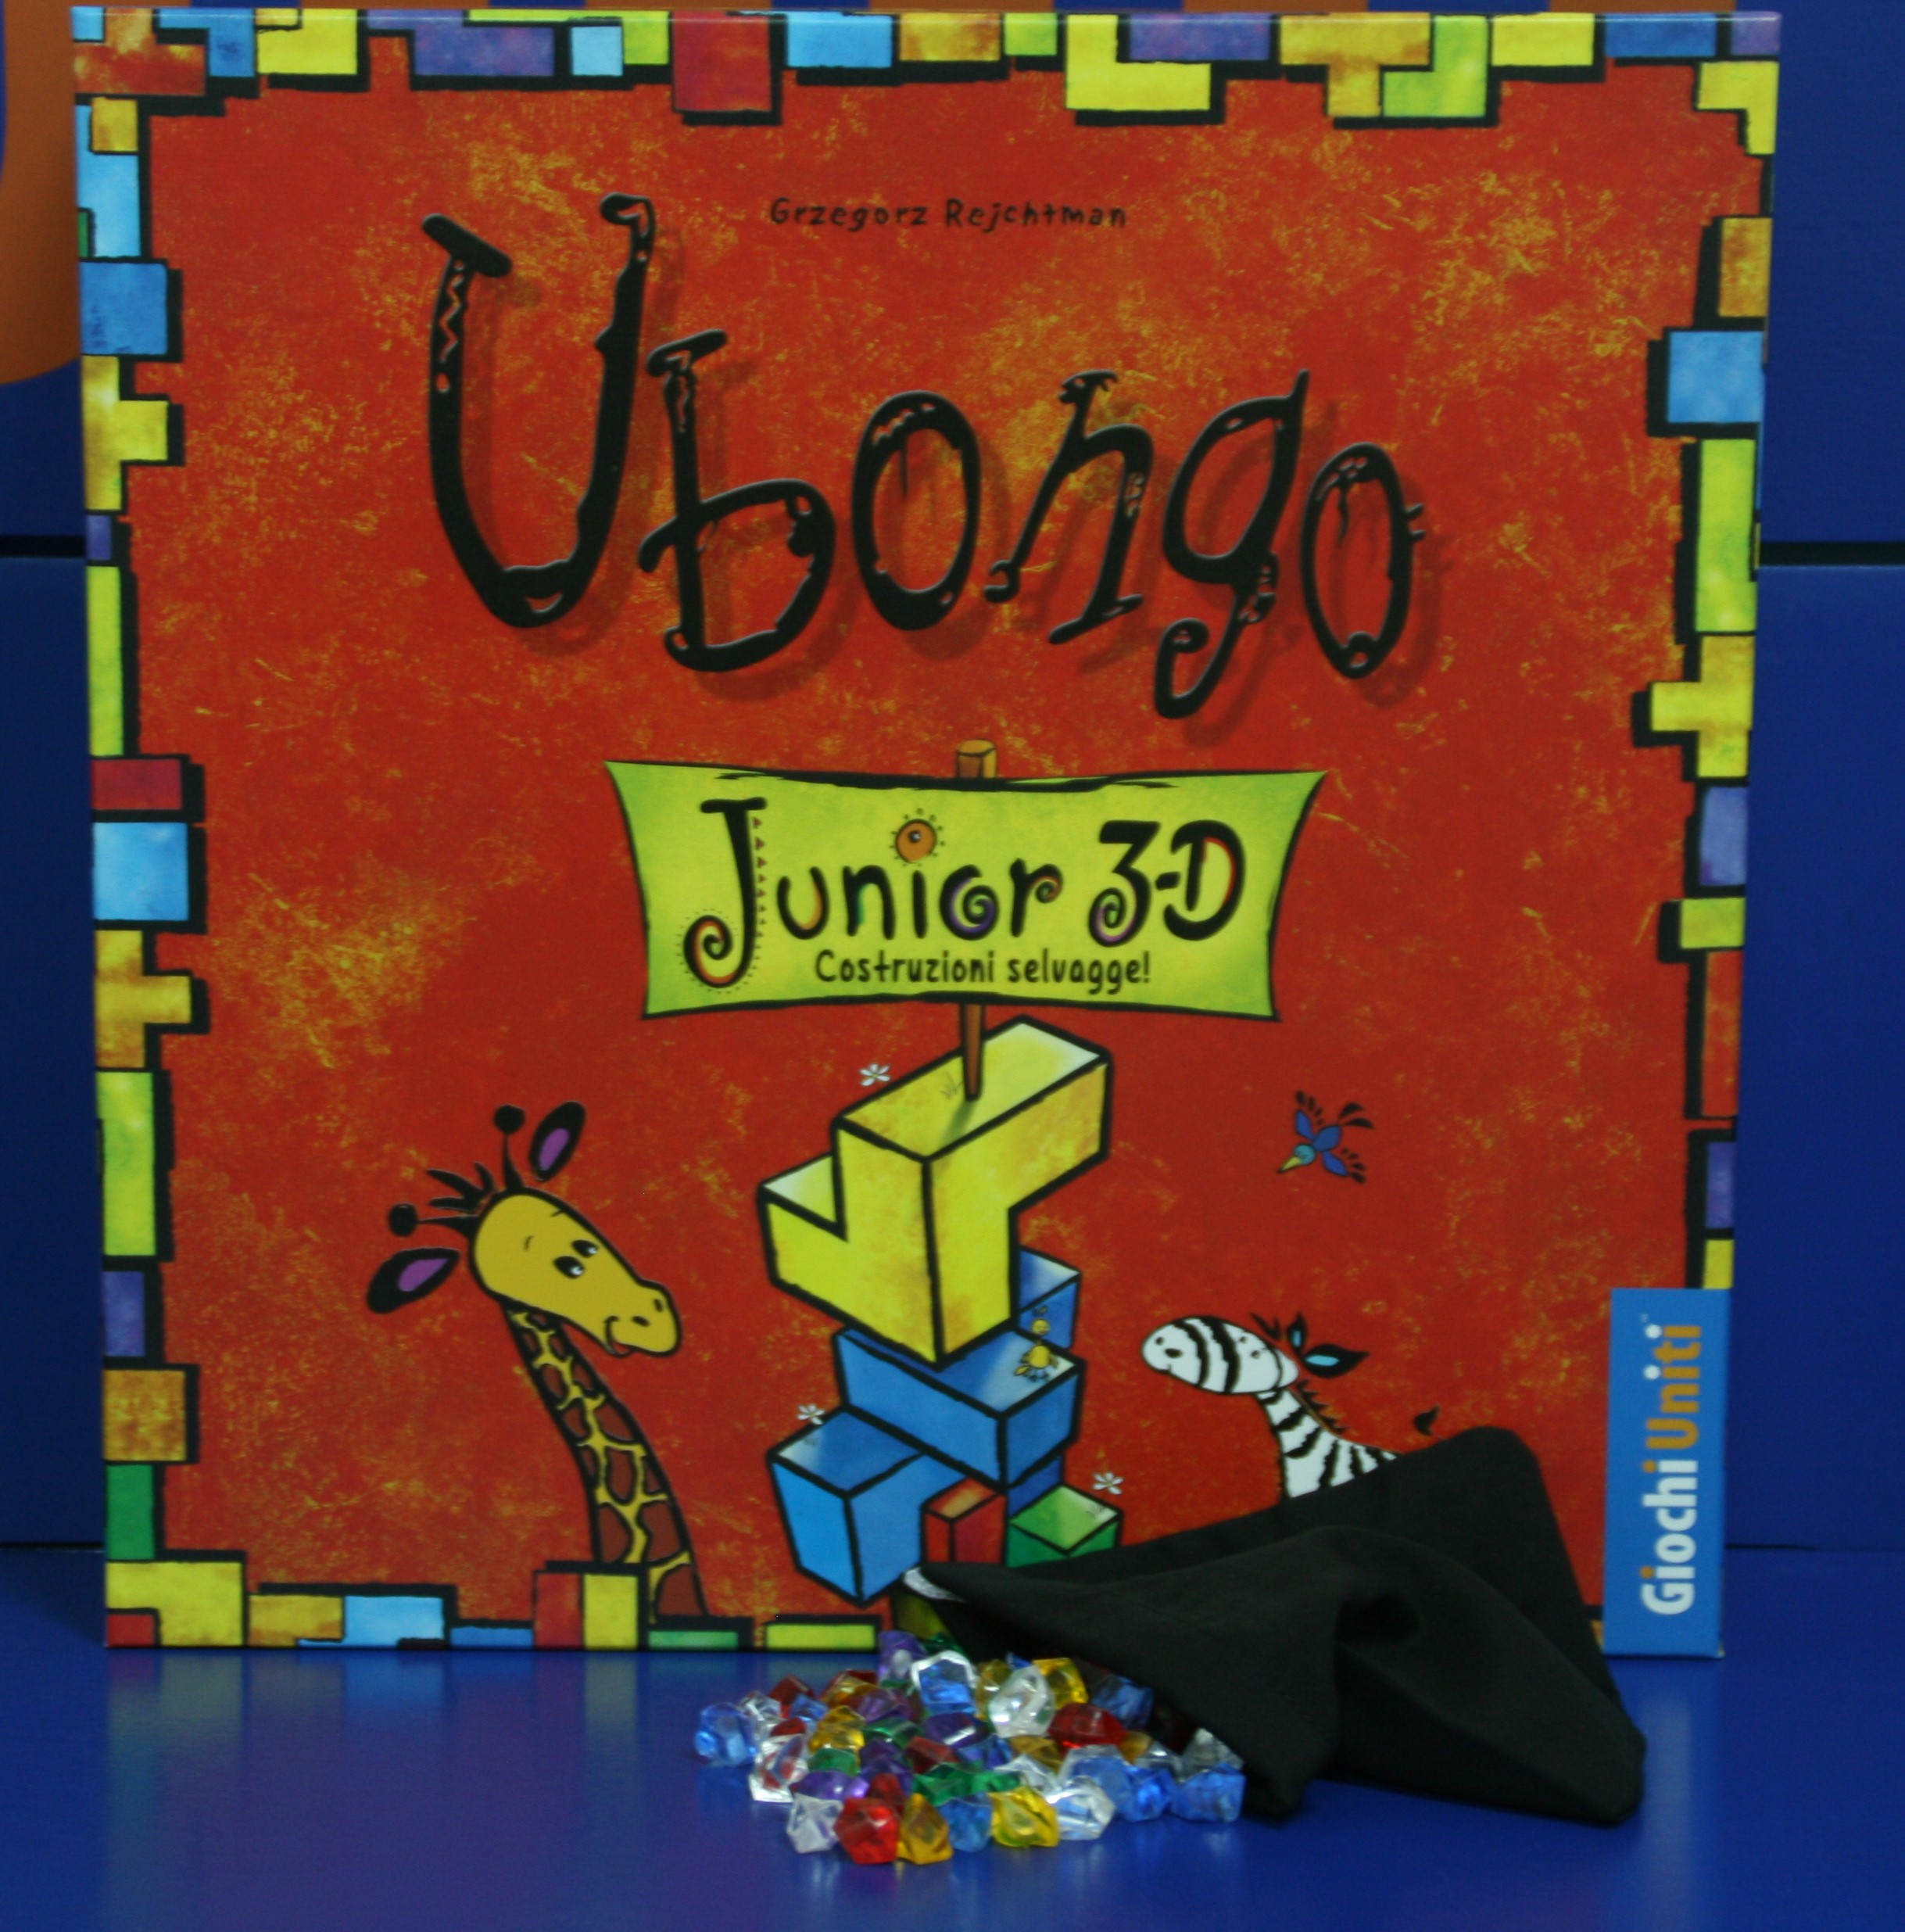 Ubongo3d_junior